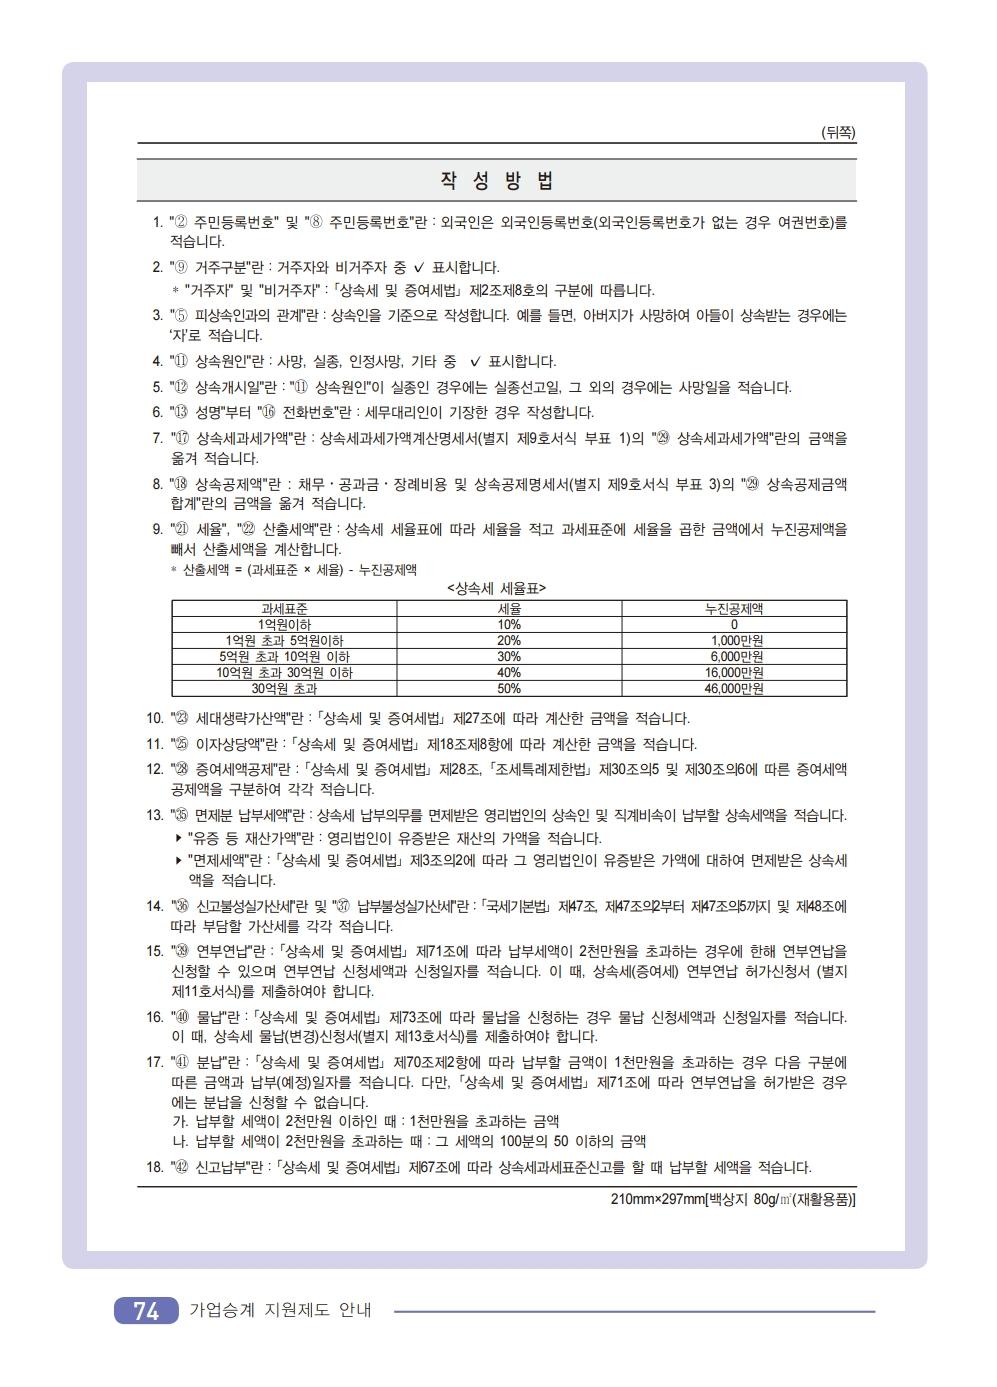 2019_tax.pdf_page_76.png